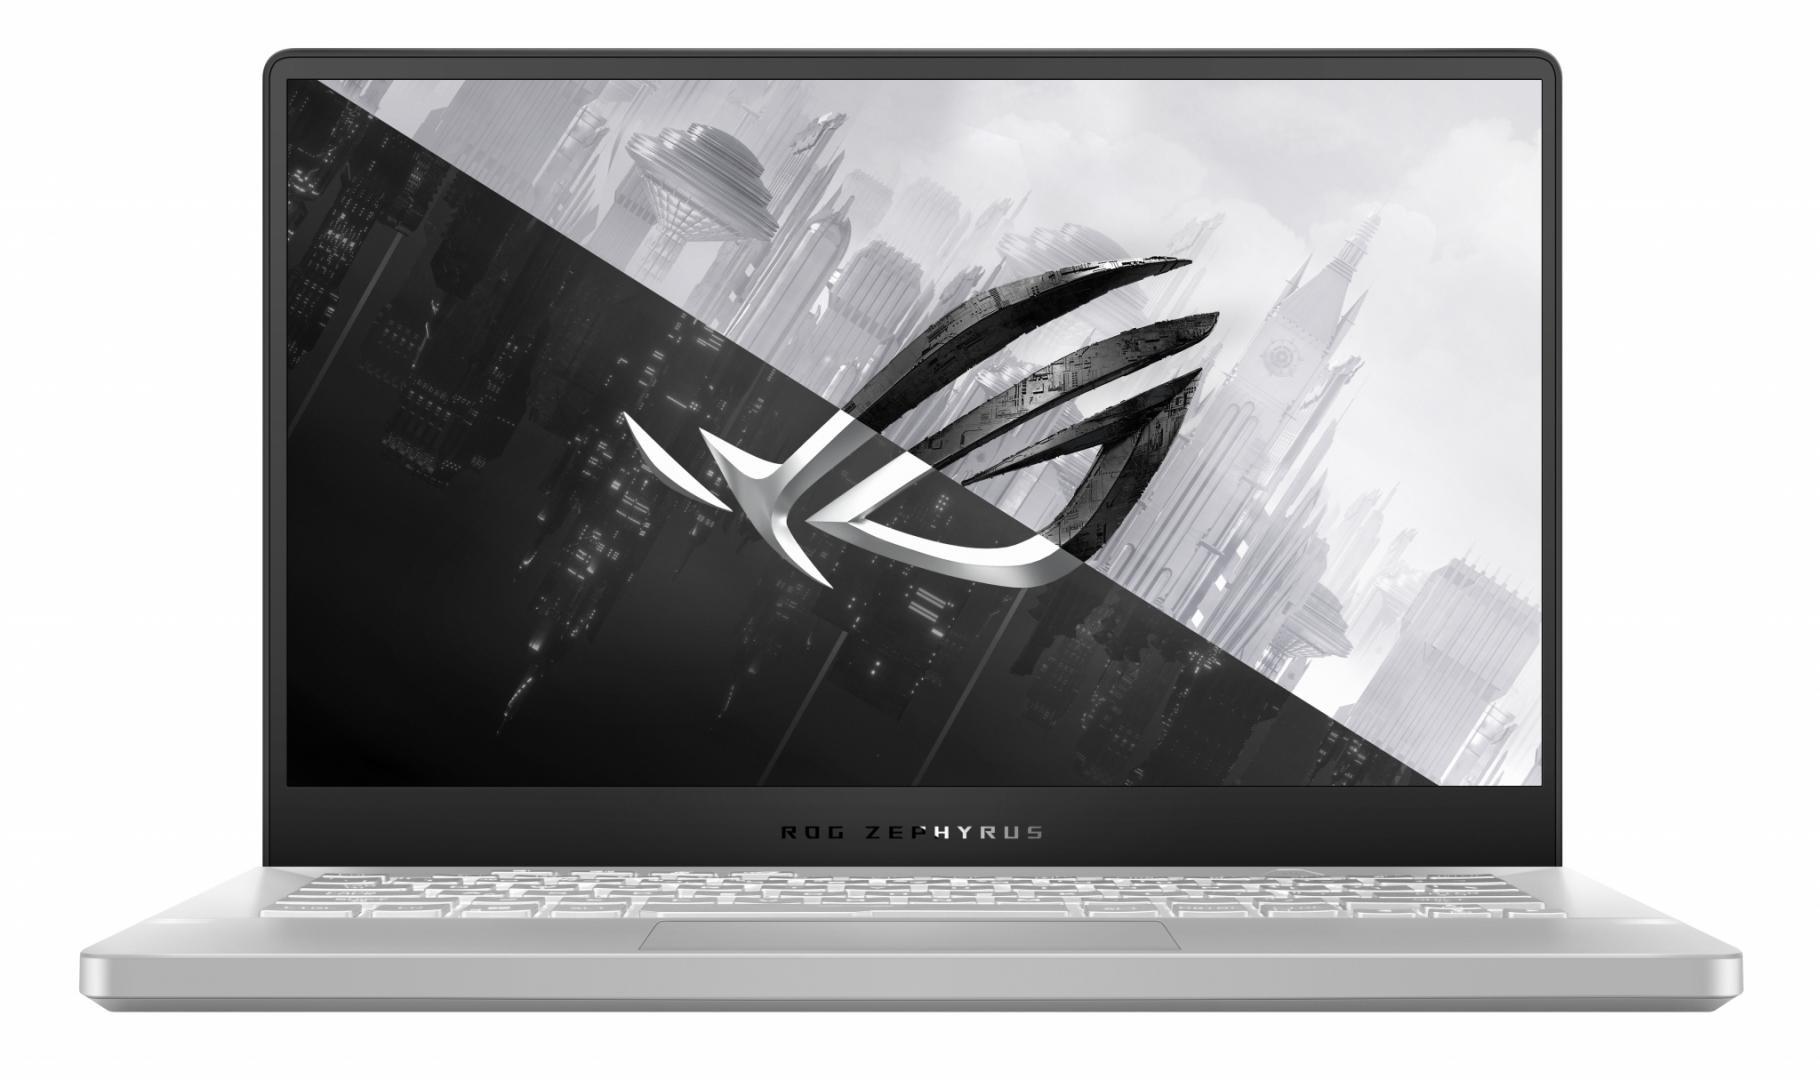 Laptop Gaming ASUS ROG Zephyrus G14 GA401QH-BM020, 14-inch, FHD (1920 x 1080) 16:9, Anti-glare display, IPS-level, AMD Ryzen™ 7 5800HS Processor 3.0GHz(16MCache,upto4.3GHz), NVIDIA®GeForceGTX™1650, 8GB DDR4 on board, 512GB M.2 NVMe™ PCIe® 3.0 SSD, Wi-Fi 6(802.11ax)+Bluetooth 5.1 (Dual - imaginea 2